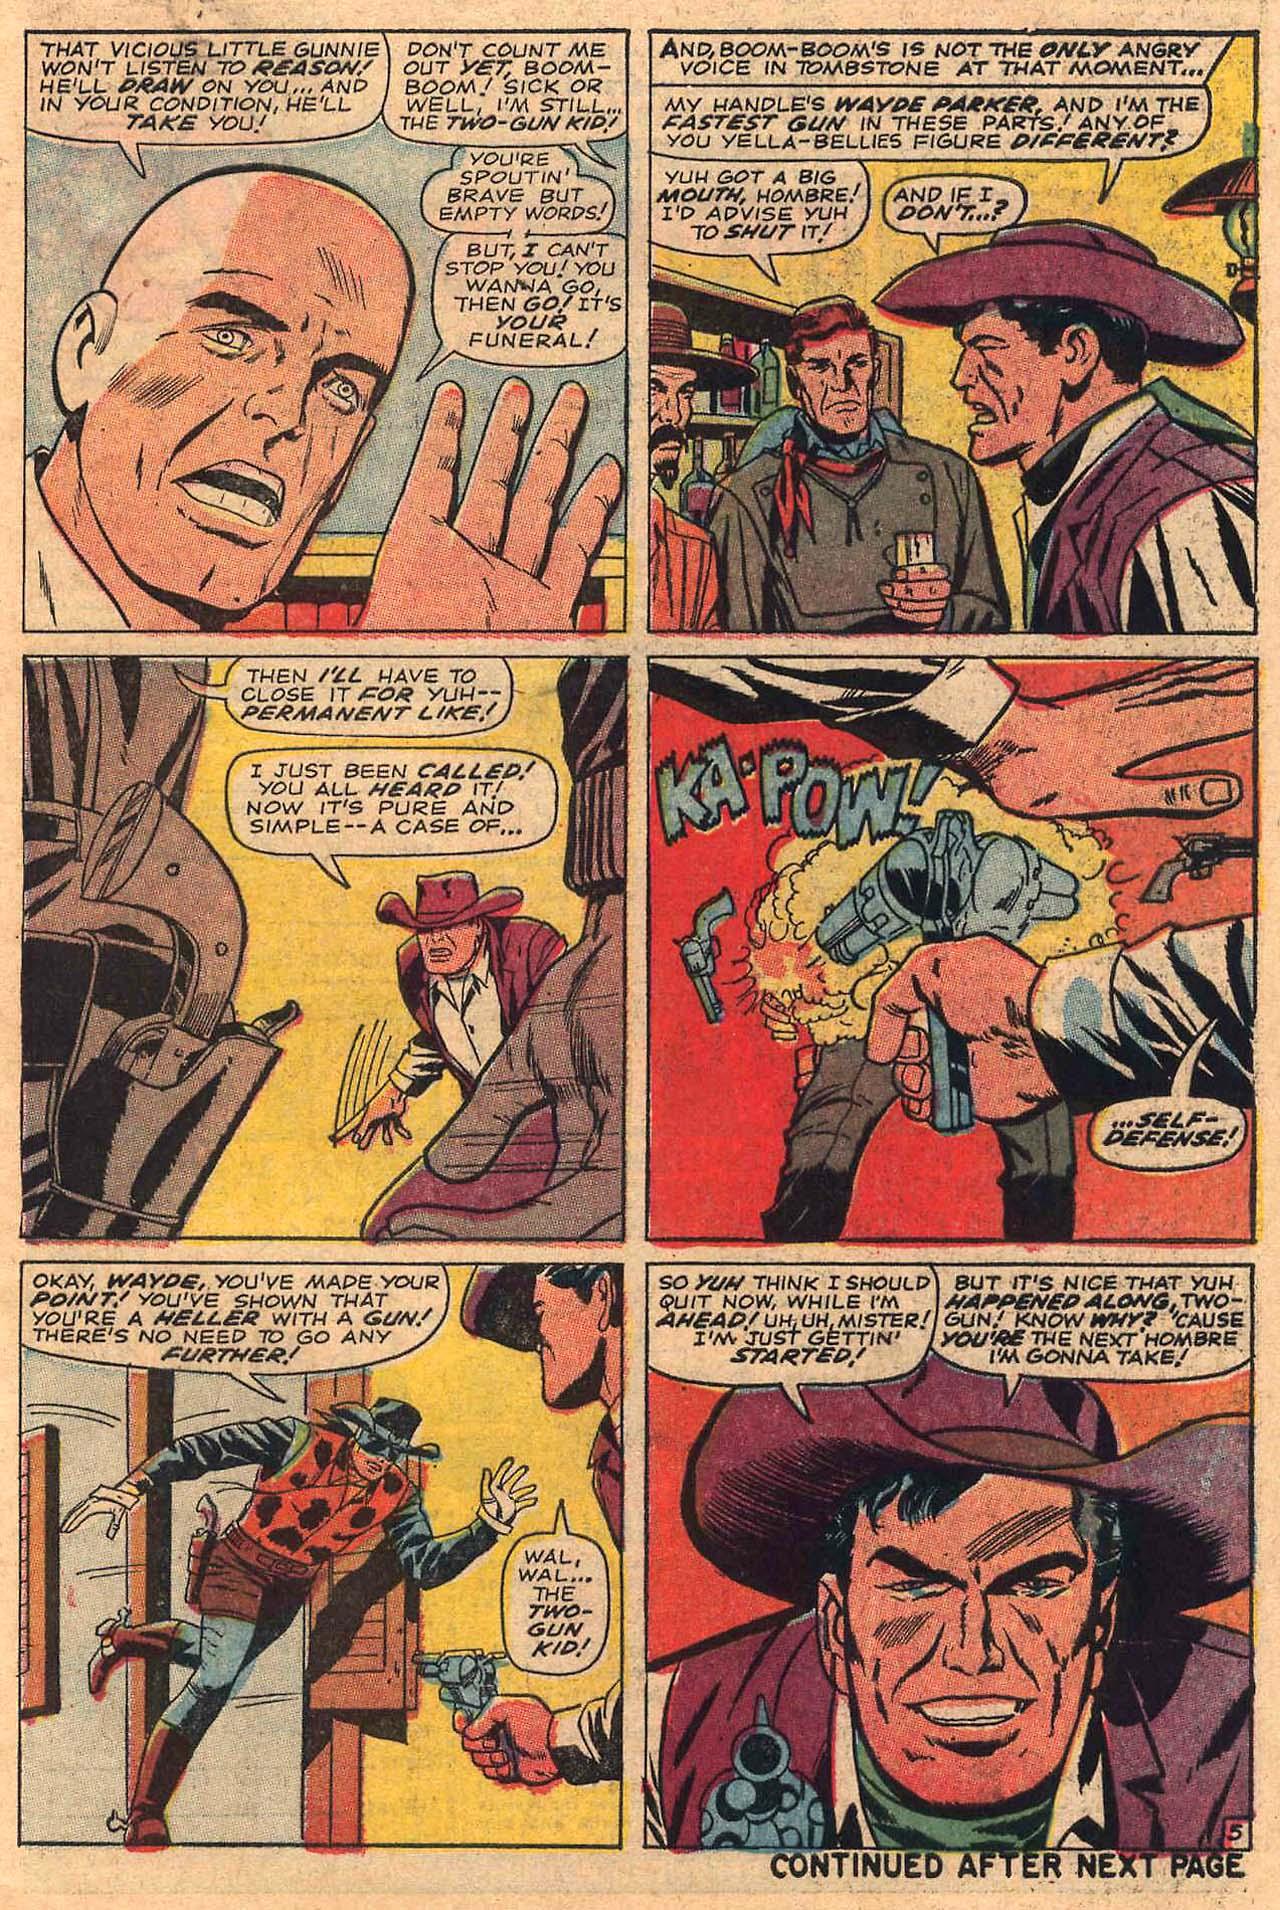 Read online Two-Gun Kid comic -  Issue #84 - 7